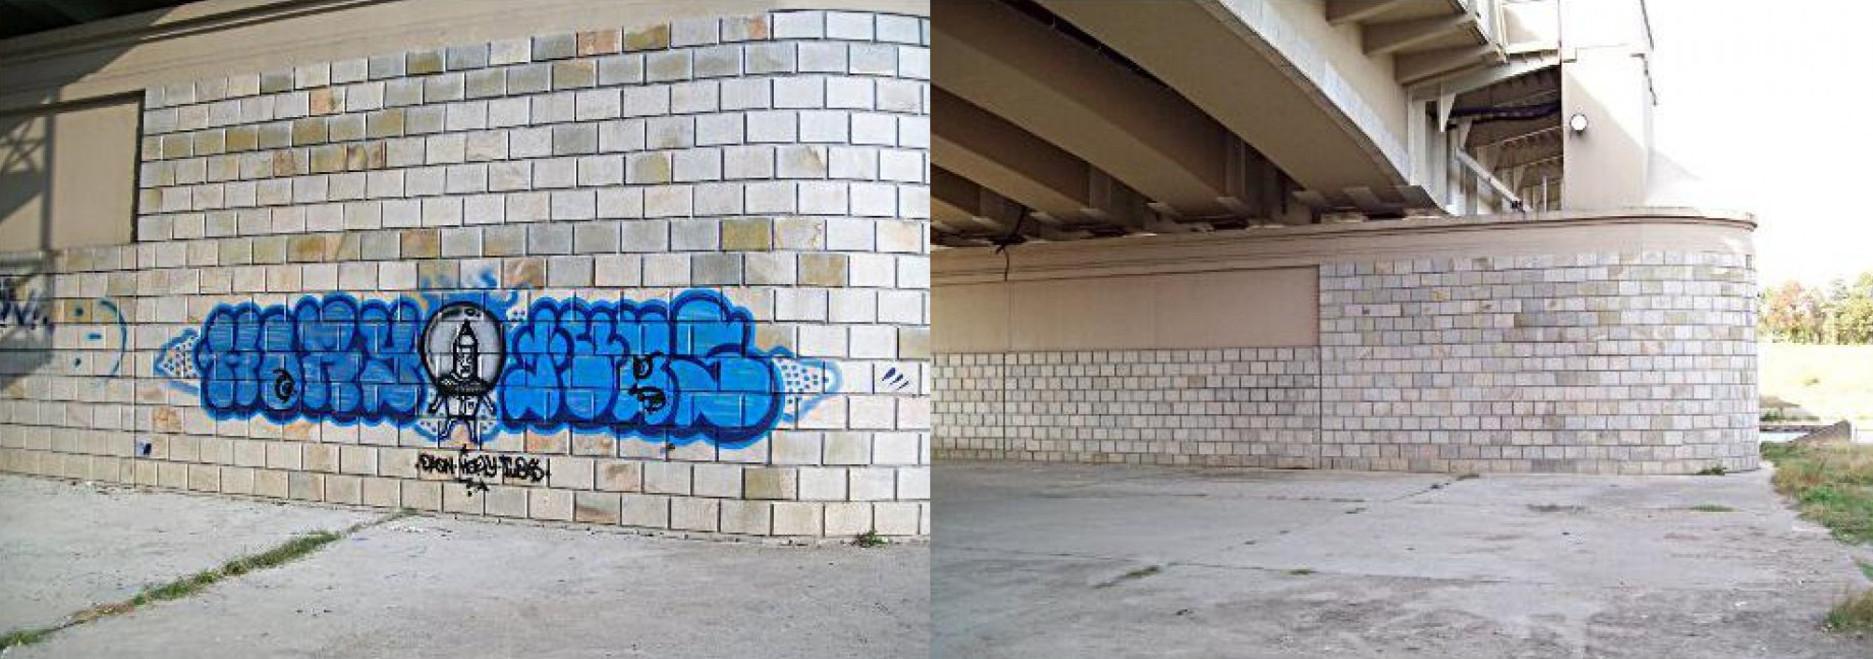 Zmywacze farb graffiti